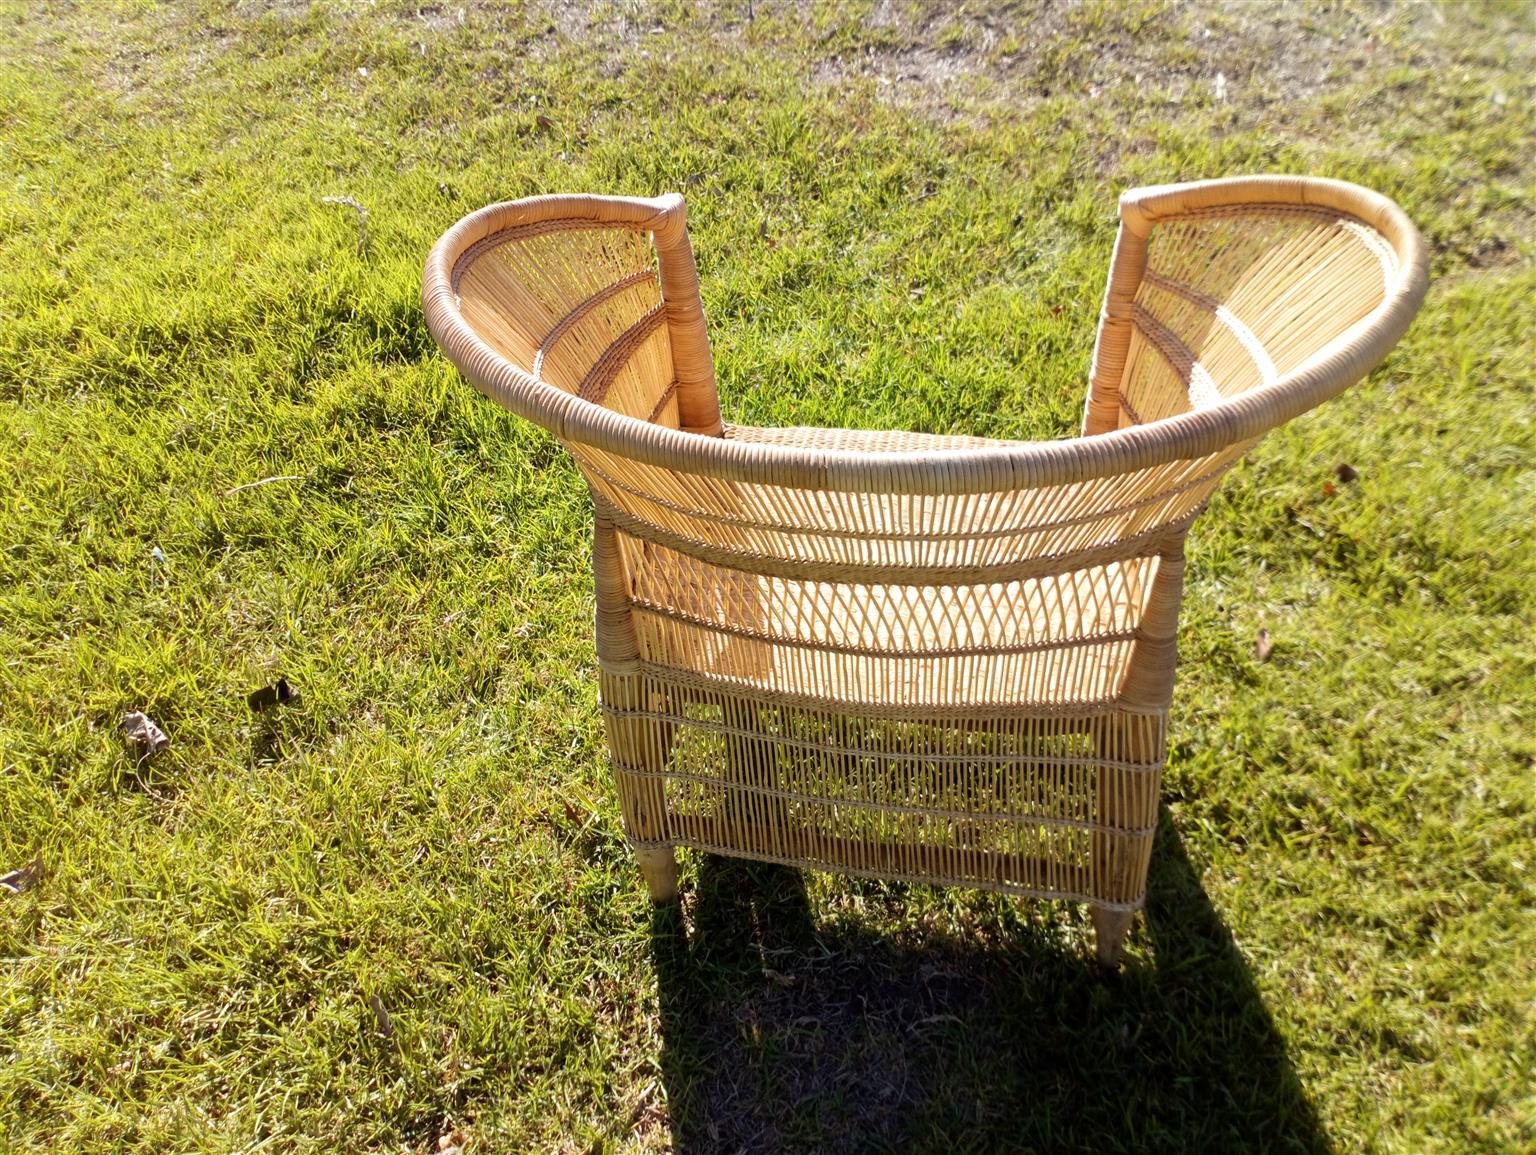 Malawi cane chairs